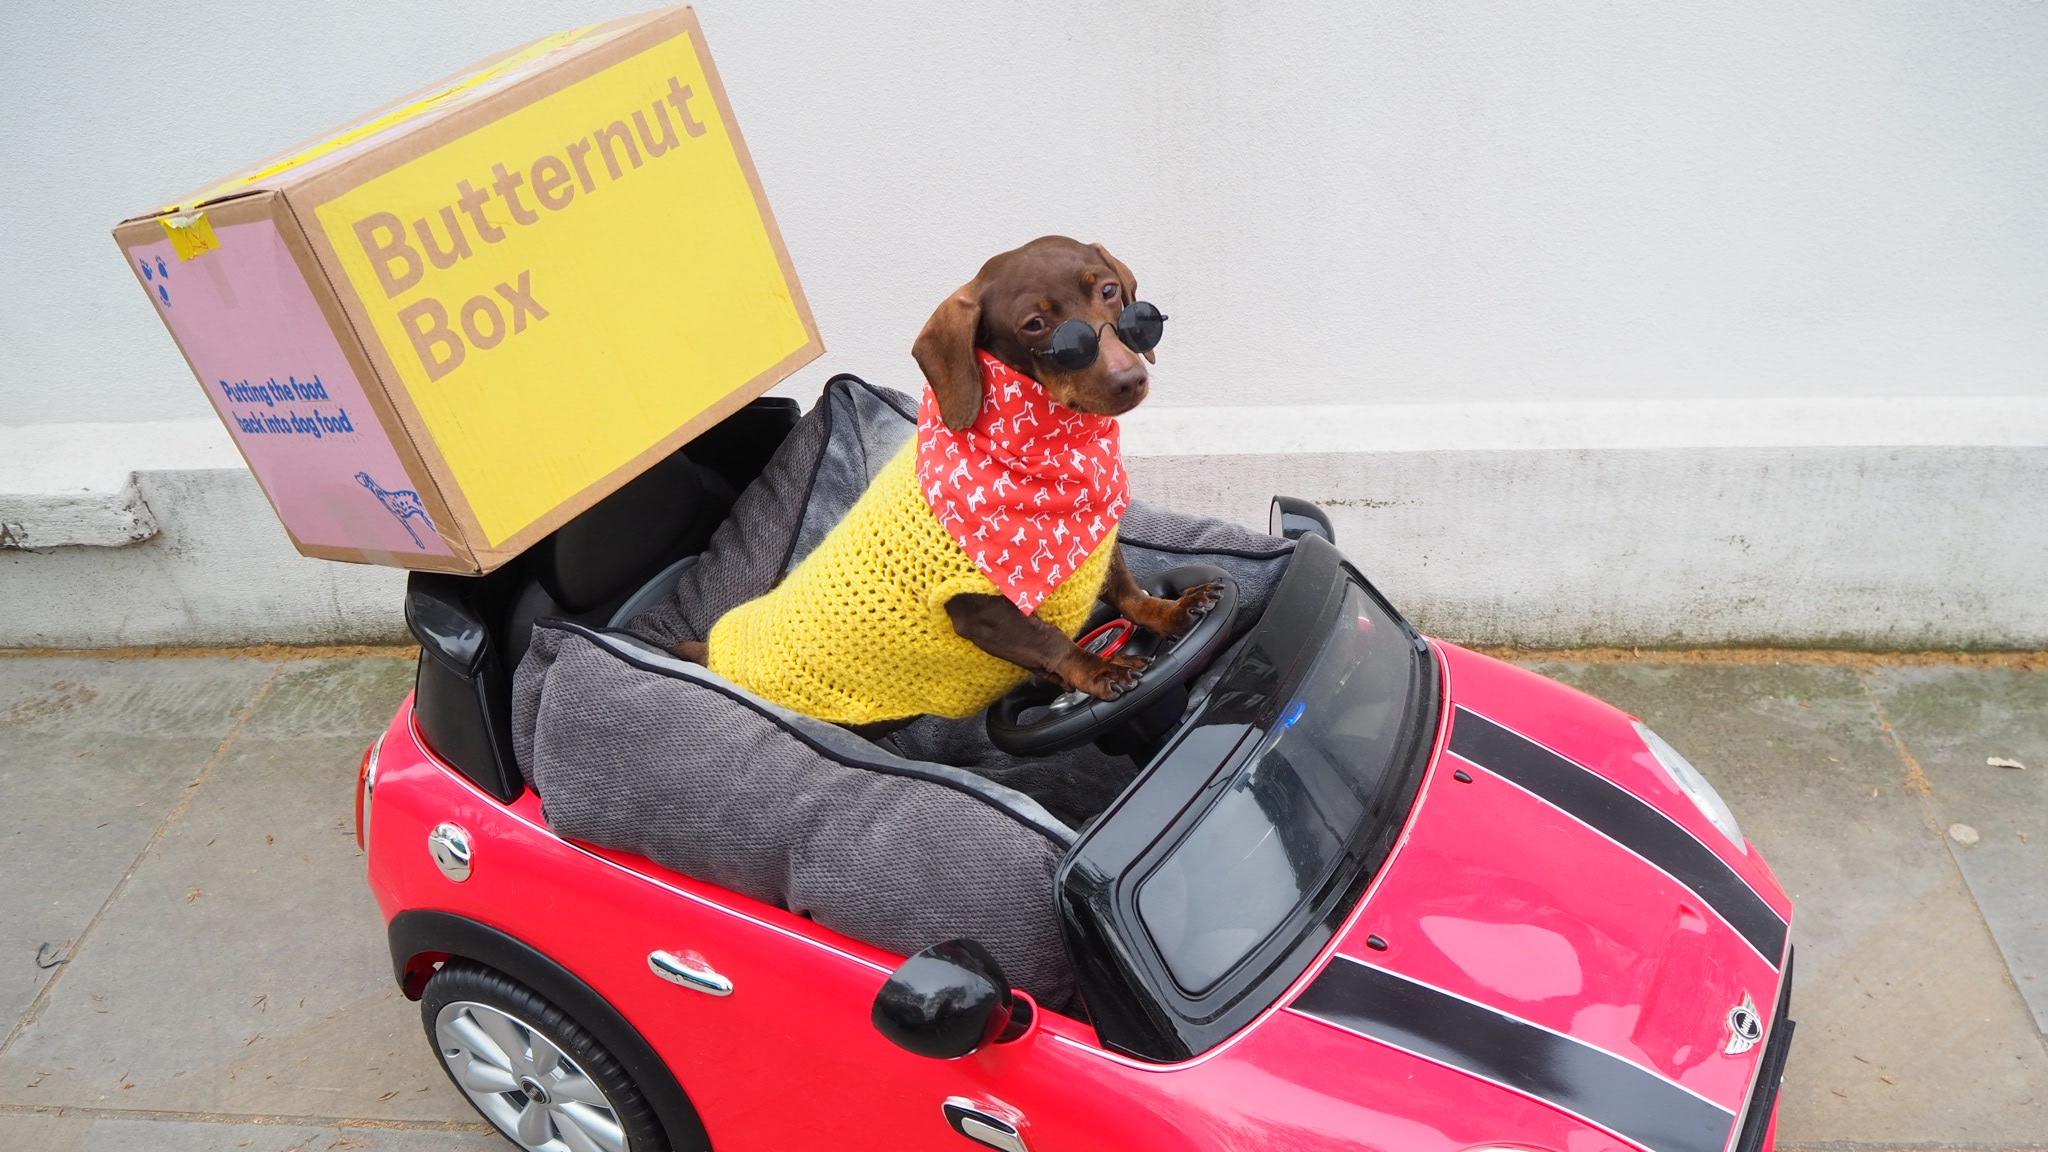 sausage dog driving butternut box mini bangers and mash dog collective